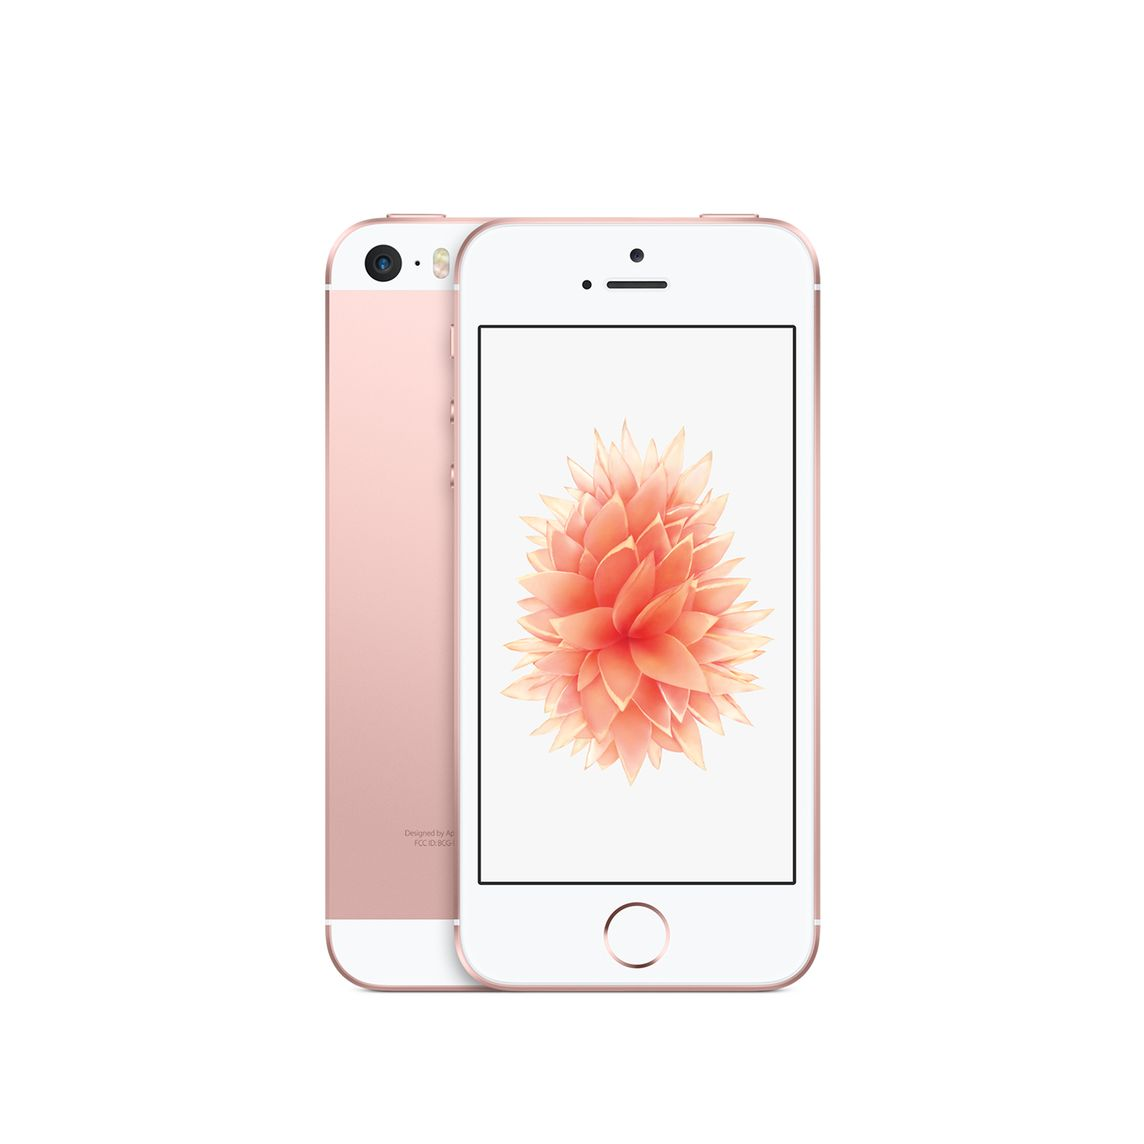 finest selection 89e28 b4cf0 iPhone SE 32GB - Rose Gold (Unlocked)